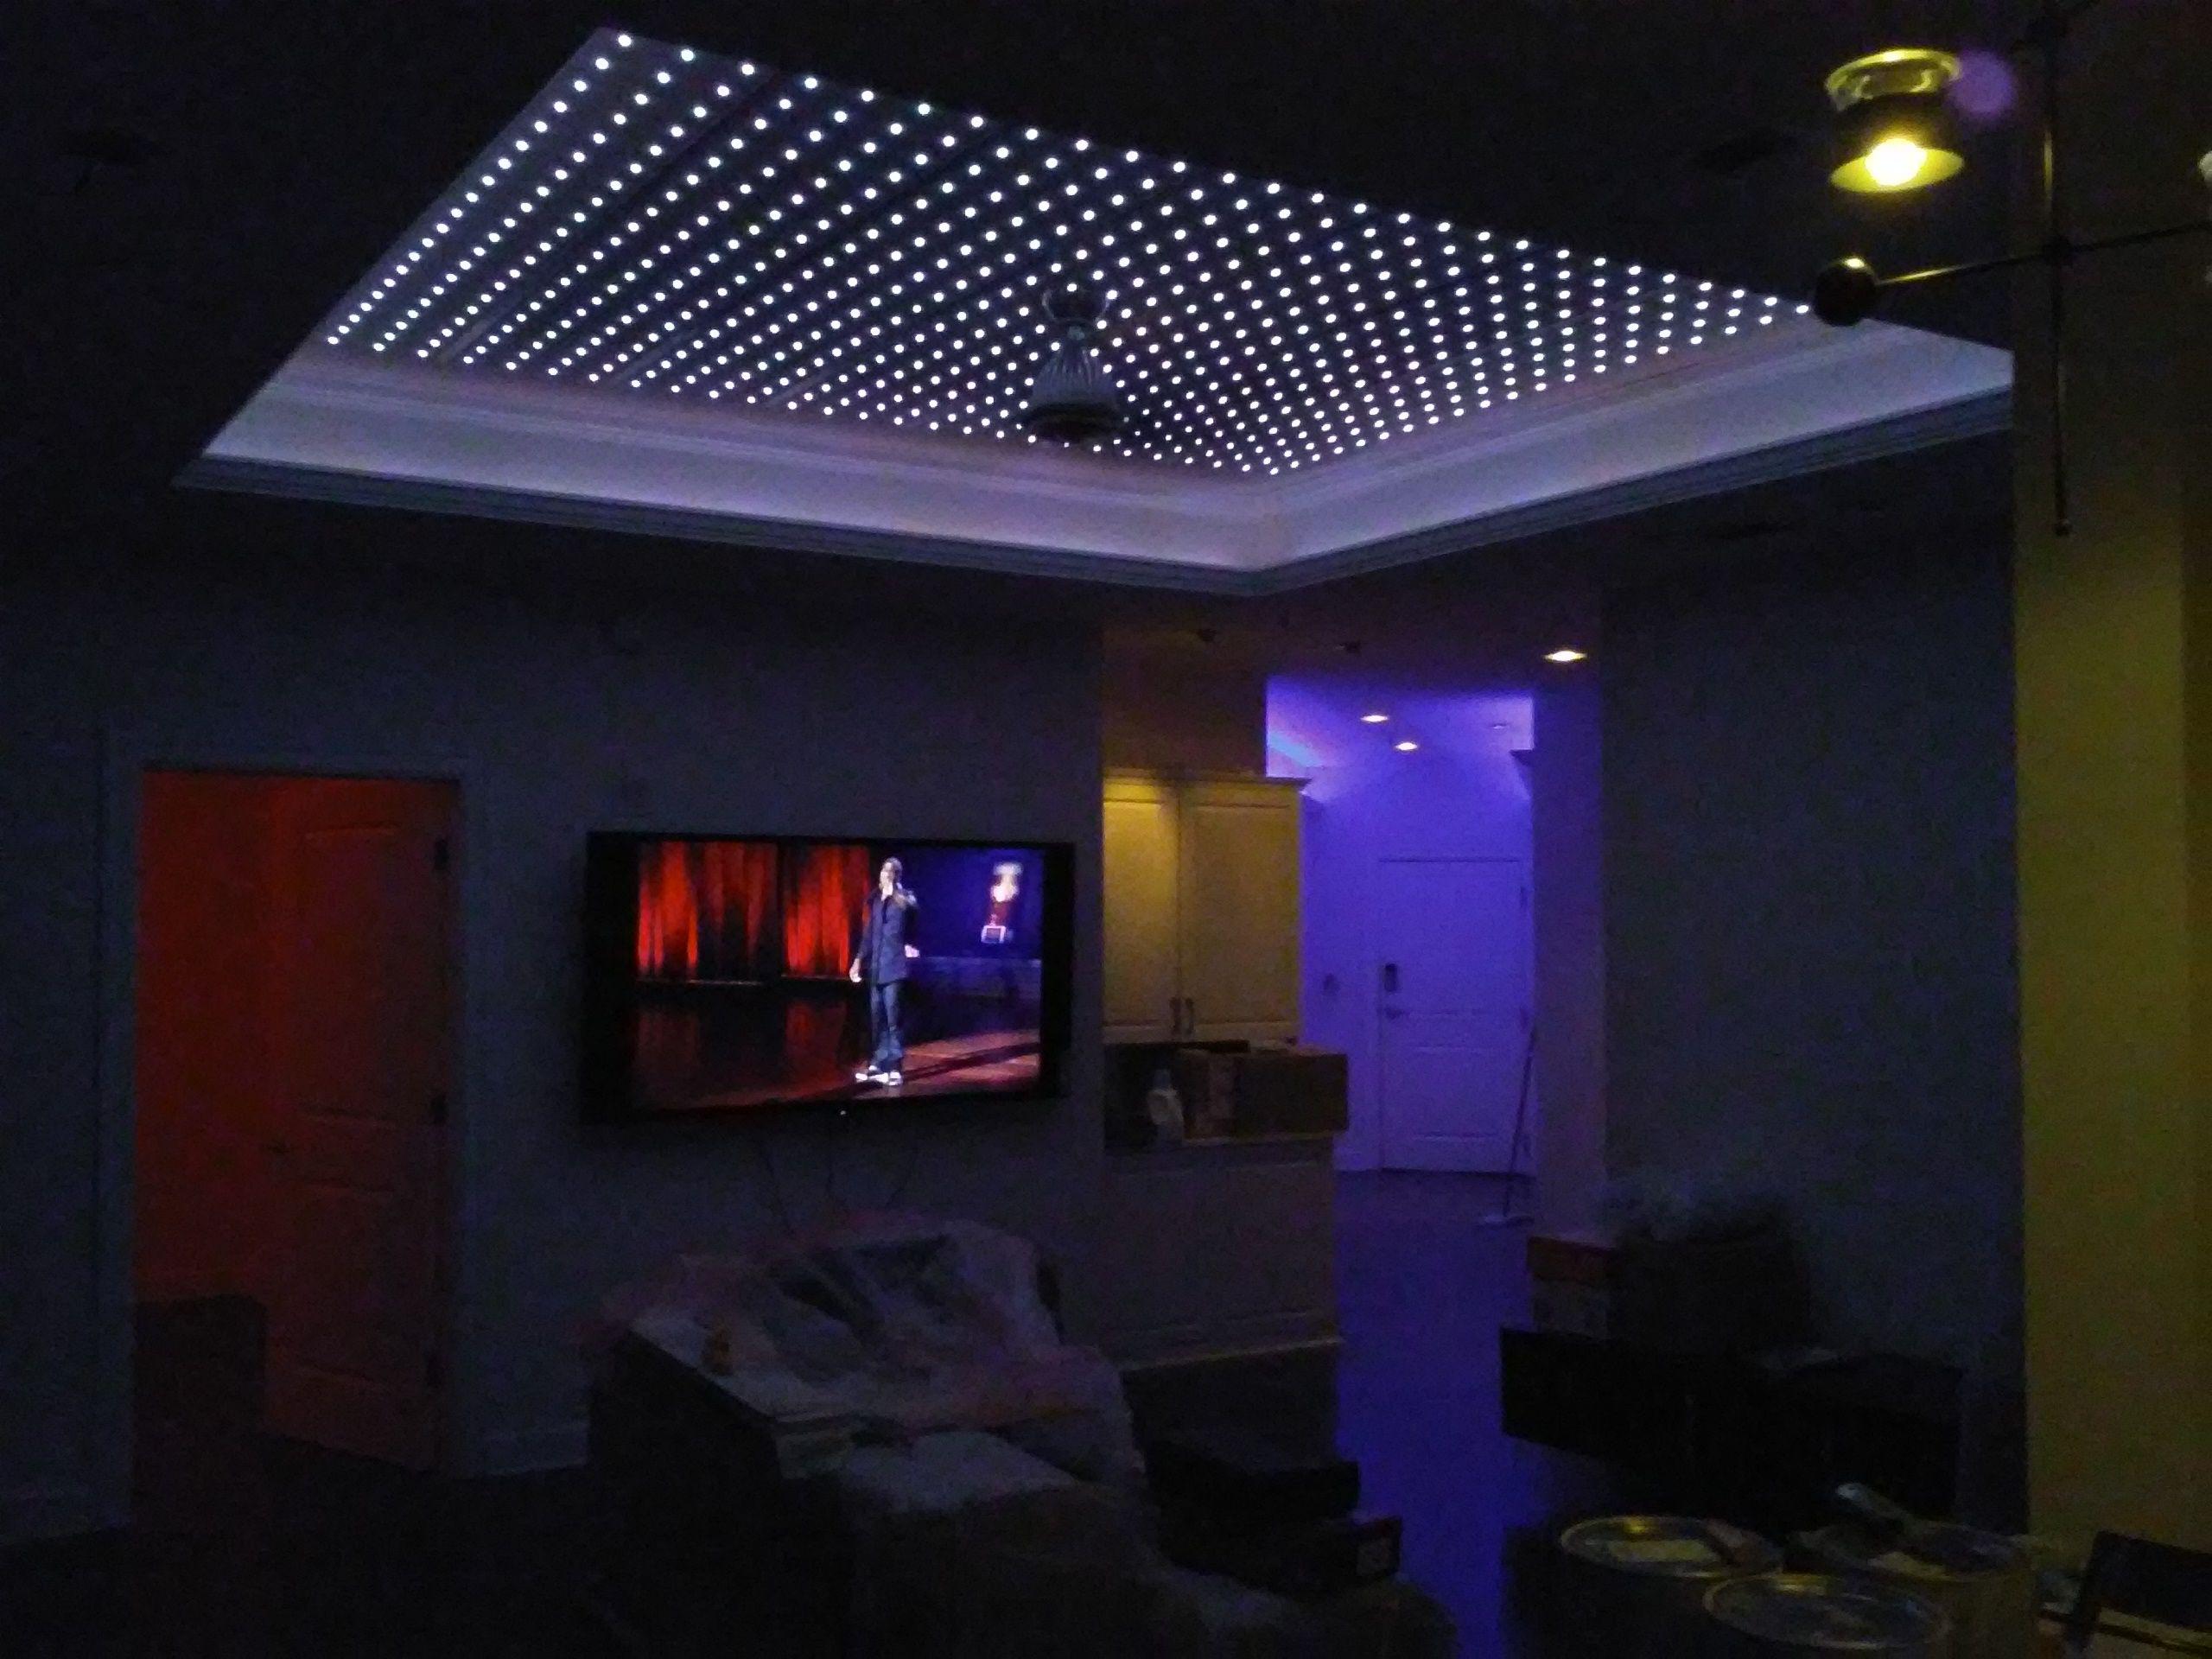 Philips Color Kinetics Installation Atlanta Ga Buckhead Light System Engine Lse W Wap Remote Icolor Flex Cove